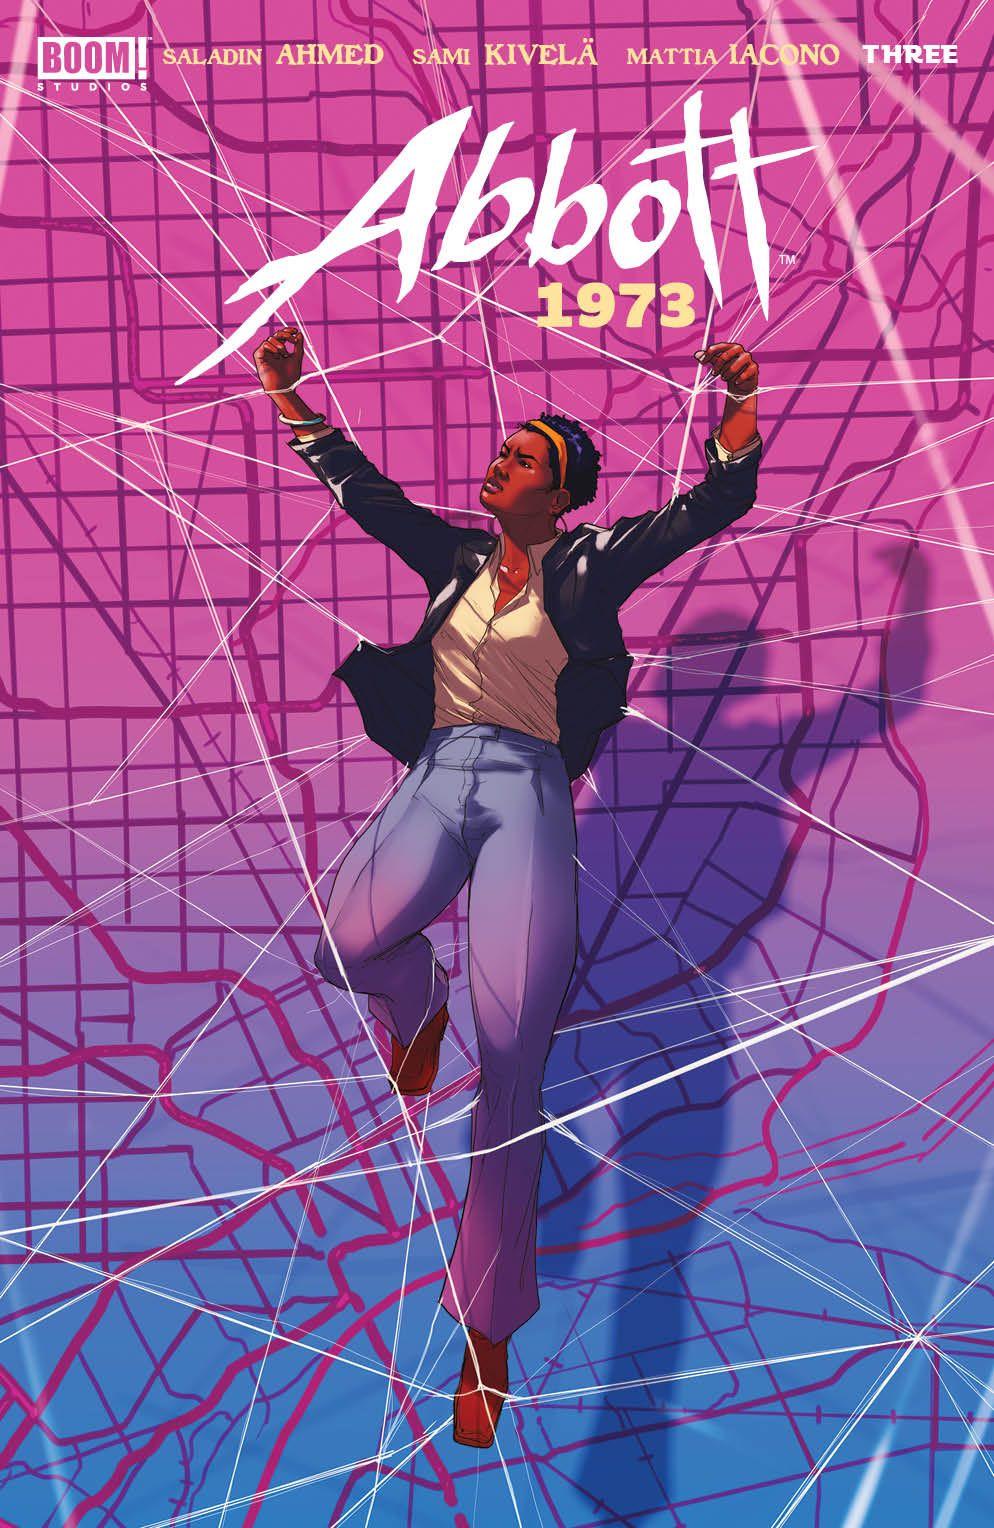 Abbott_1973_003_Cover_A_Main ComicList: BOOM! Studios New Releases for 03/17/2021